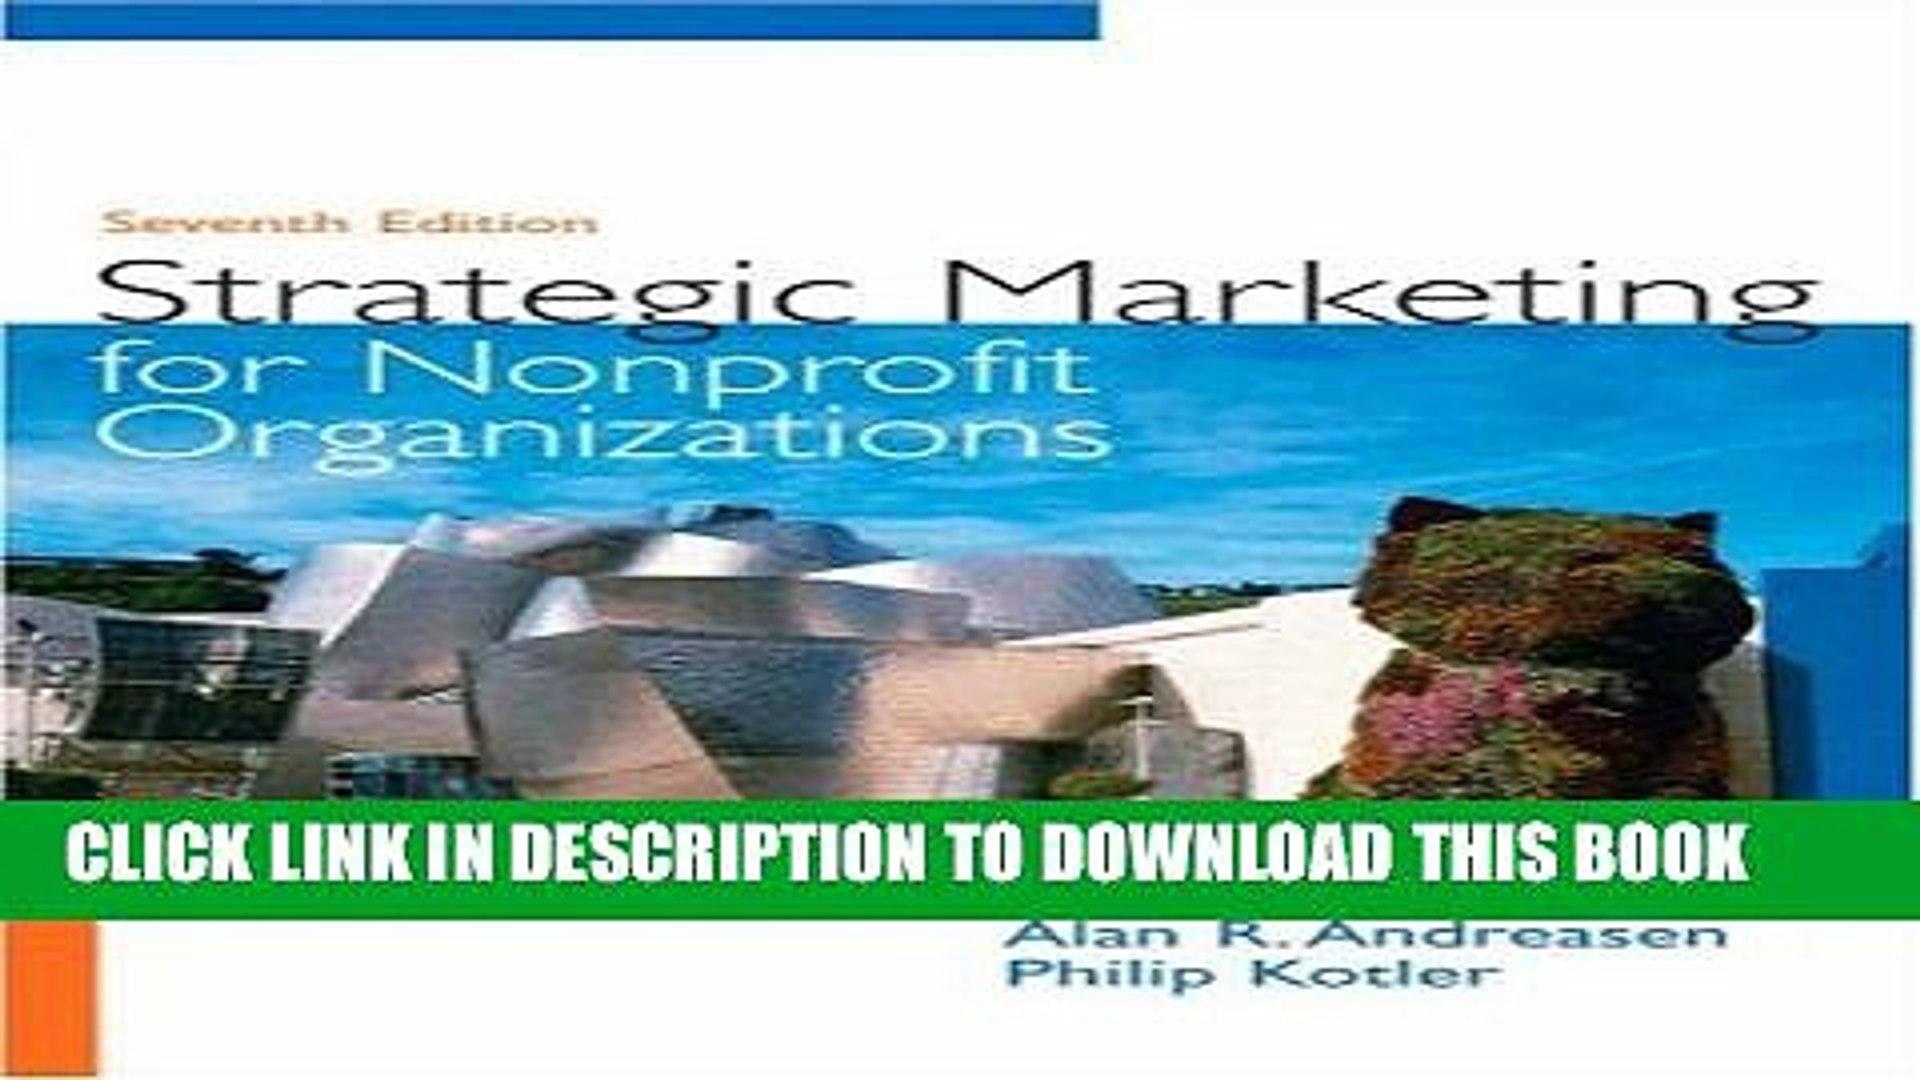 [Read PDF] Strategic Marketing for Non-Profit Organizations (7th Edition) Download Free